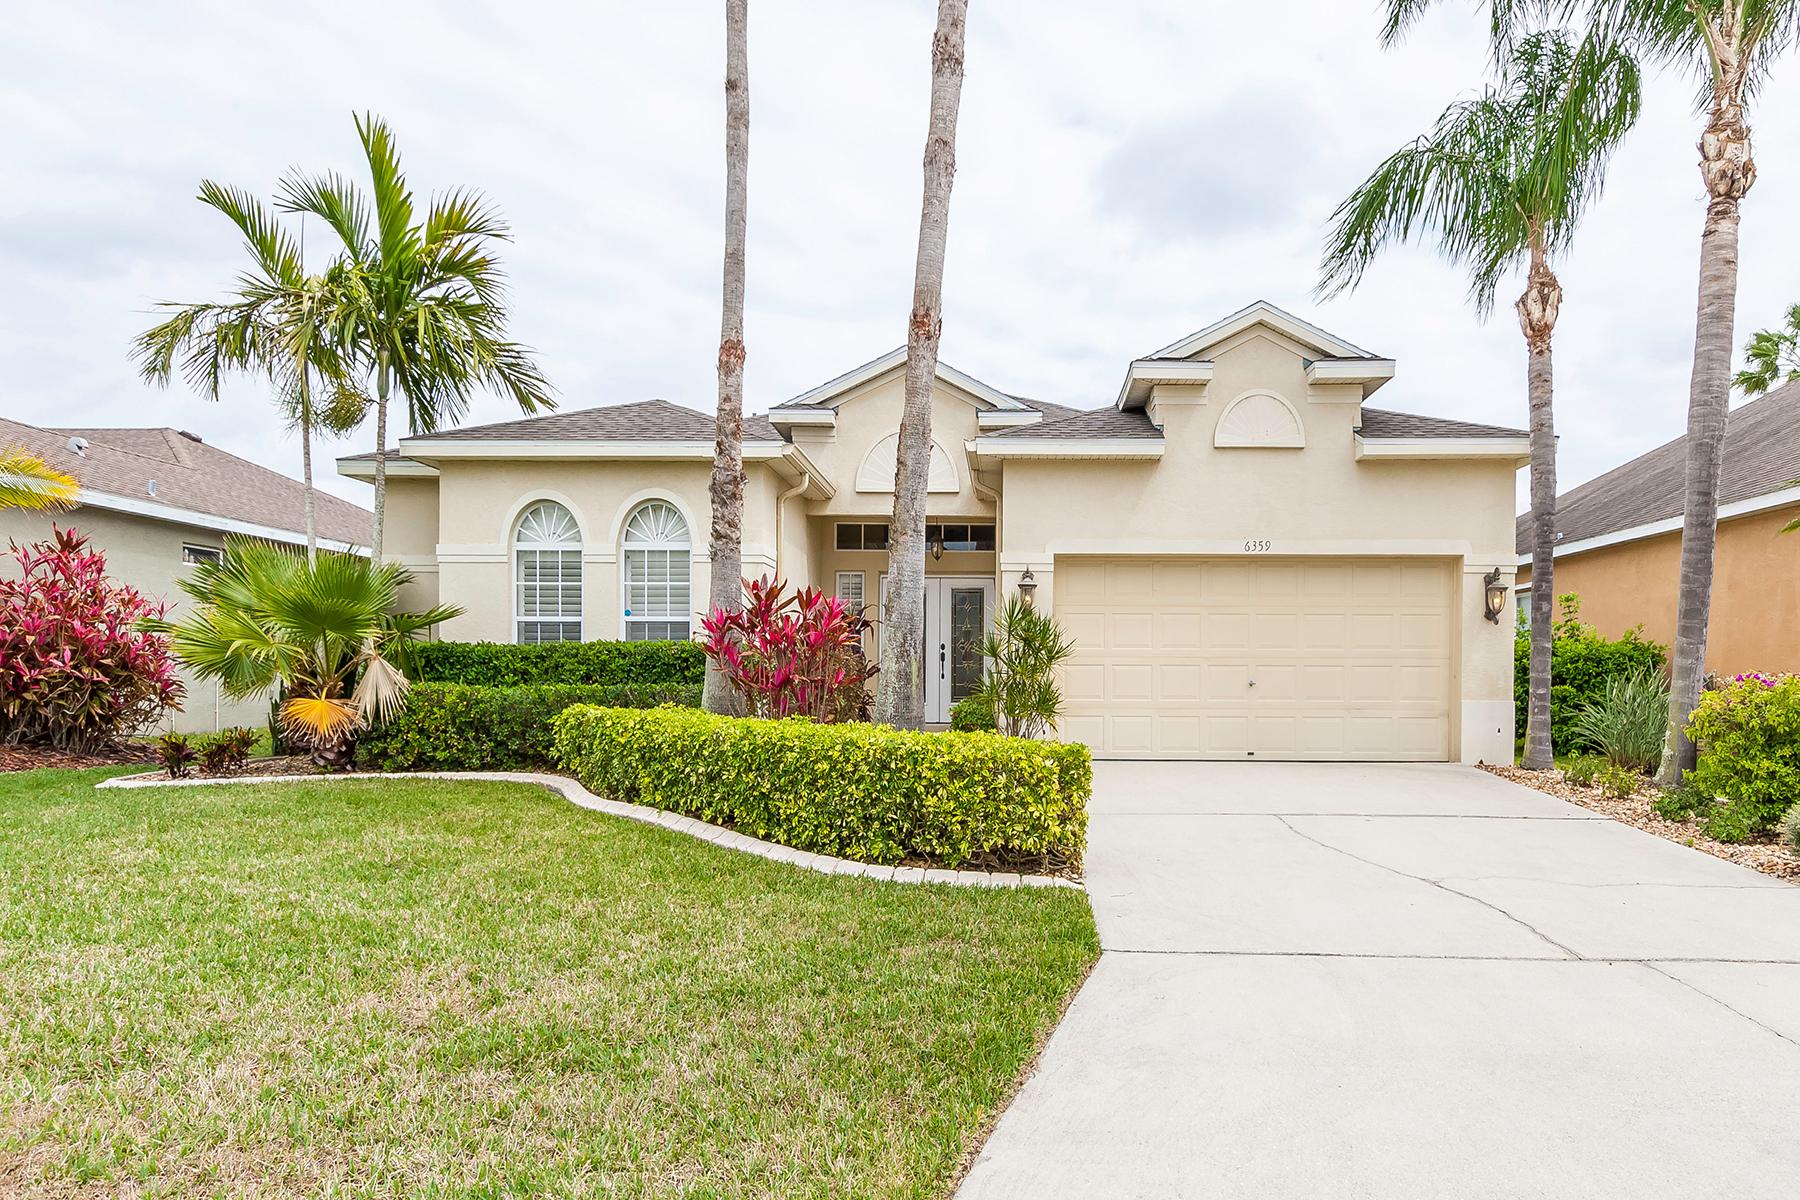 واحد منزل الأسرة للـ Sale في WELLINGTON CHASE 6359 Sturbridge Ct, Sarasota, Florida, 34238 United States